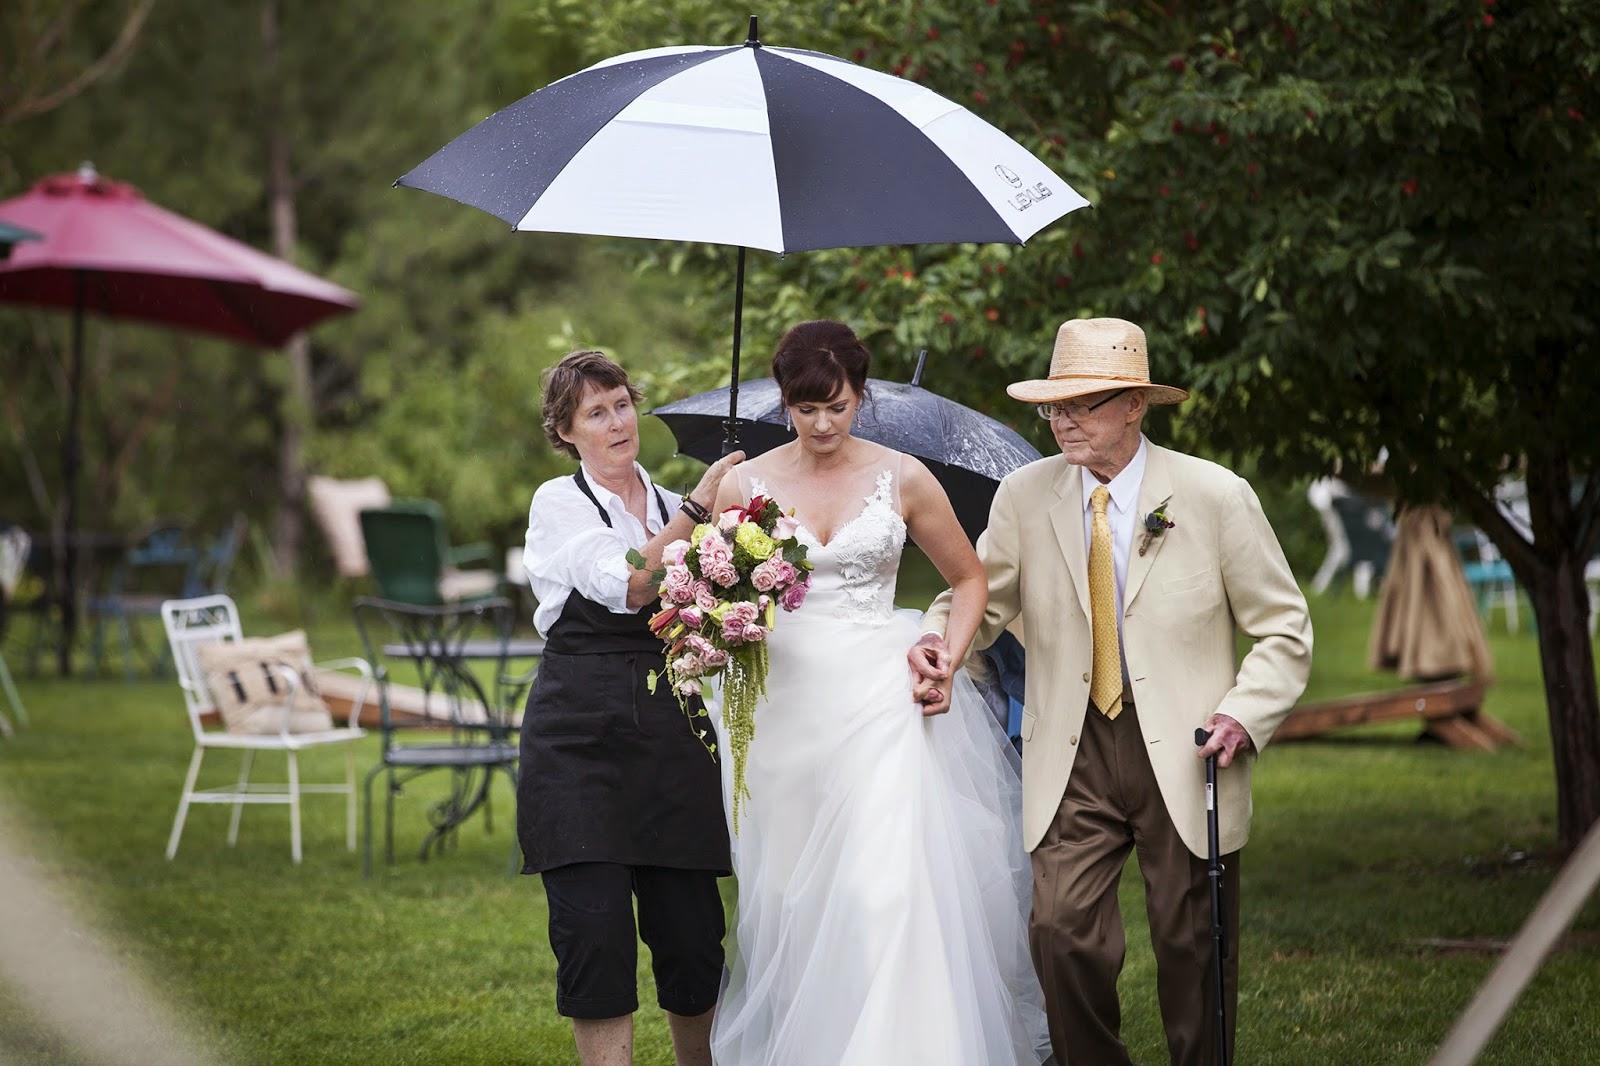 "The bride is still walking down the aisle, despite the ""rain plan"" in effect"